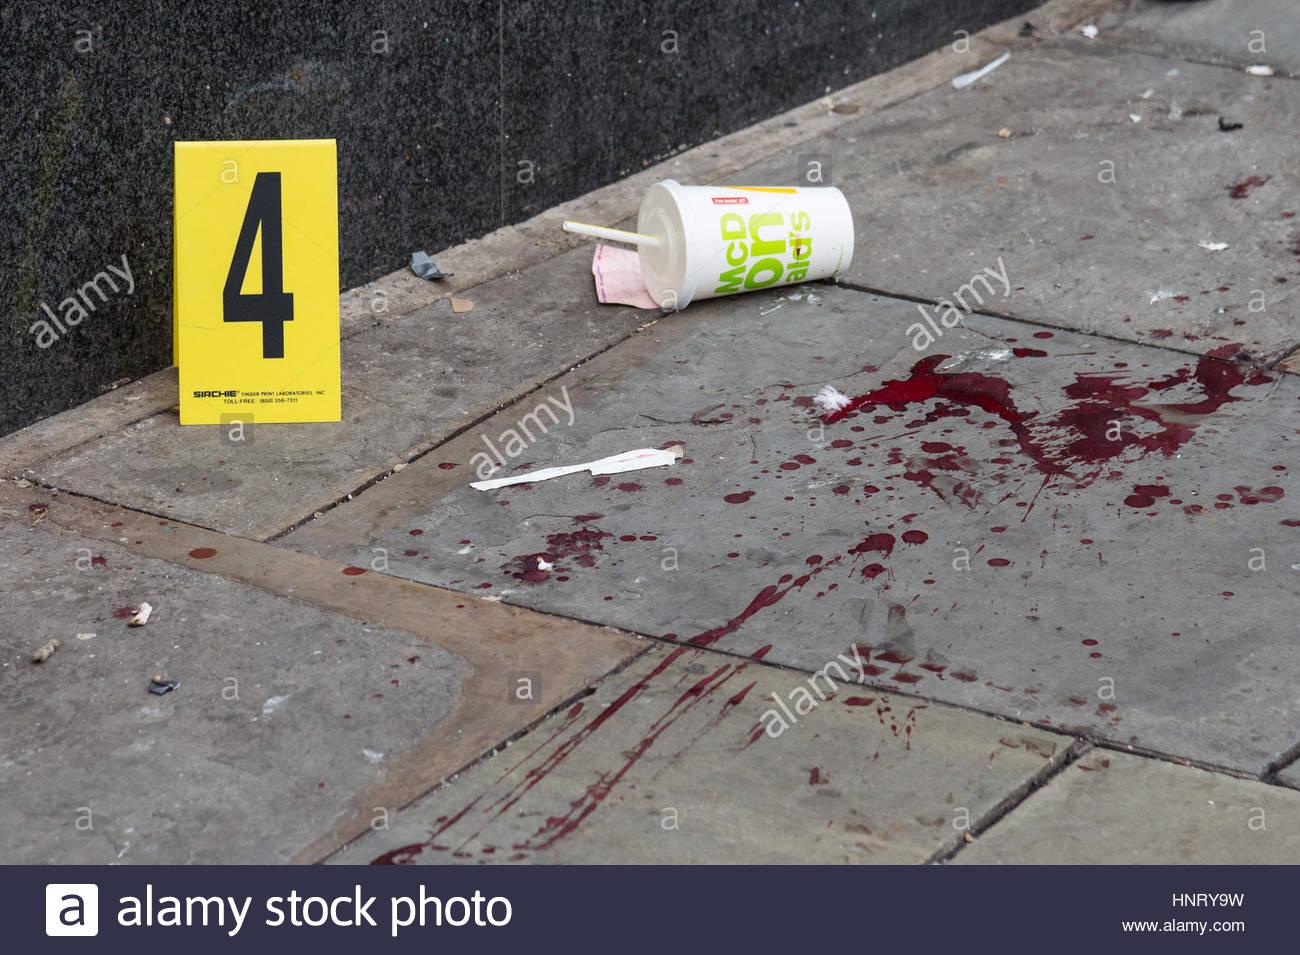 london, london, uk. 15th feb, 2017. forensics team gather evidence